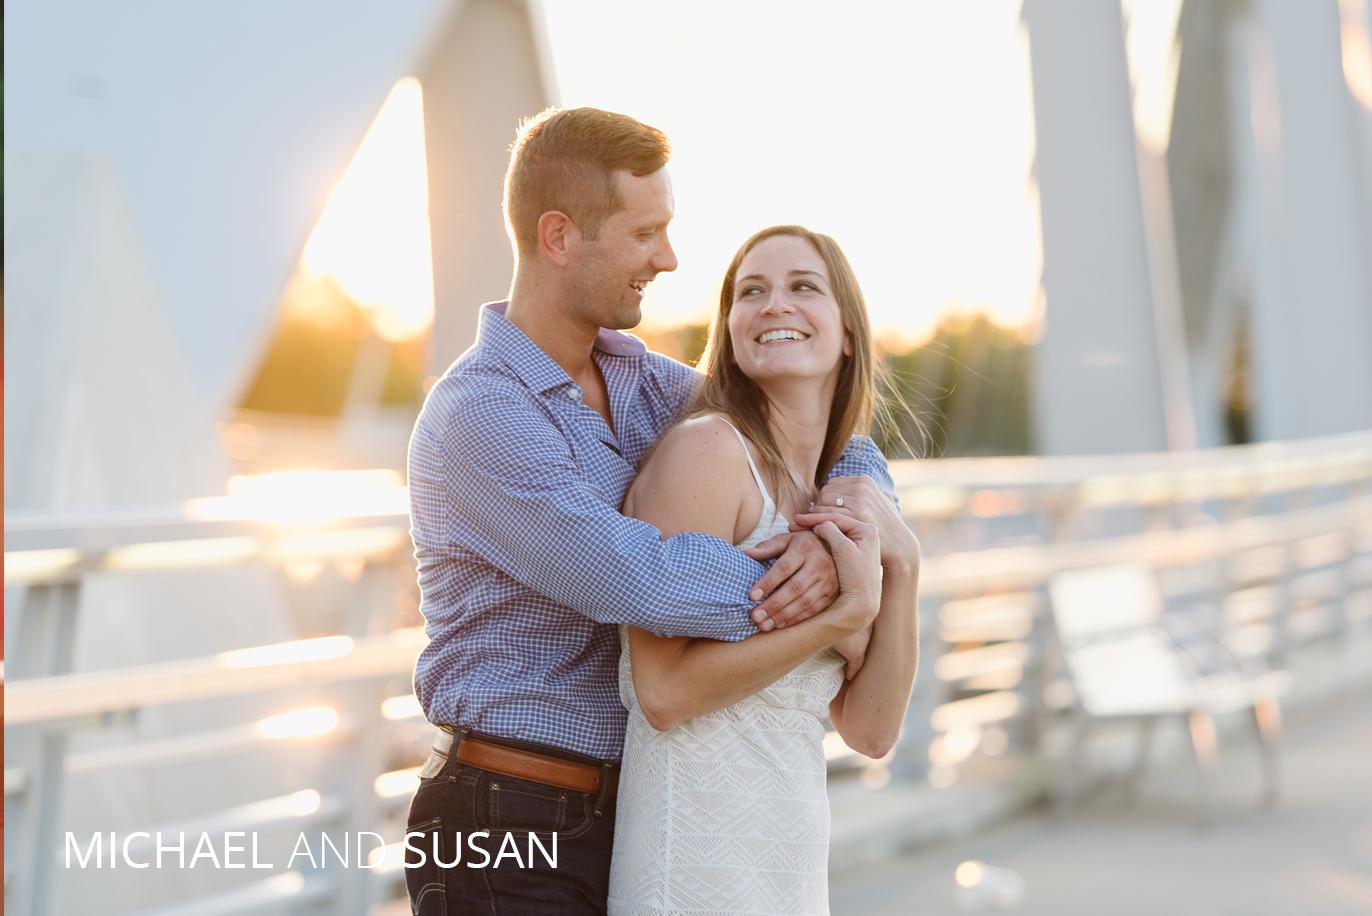 michael and susan hugging on the main street bridge at sunset